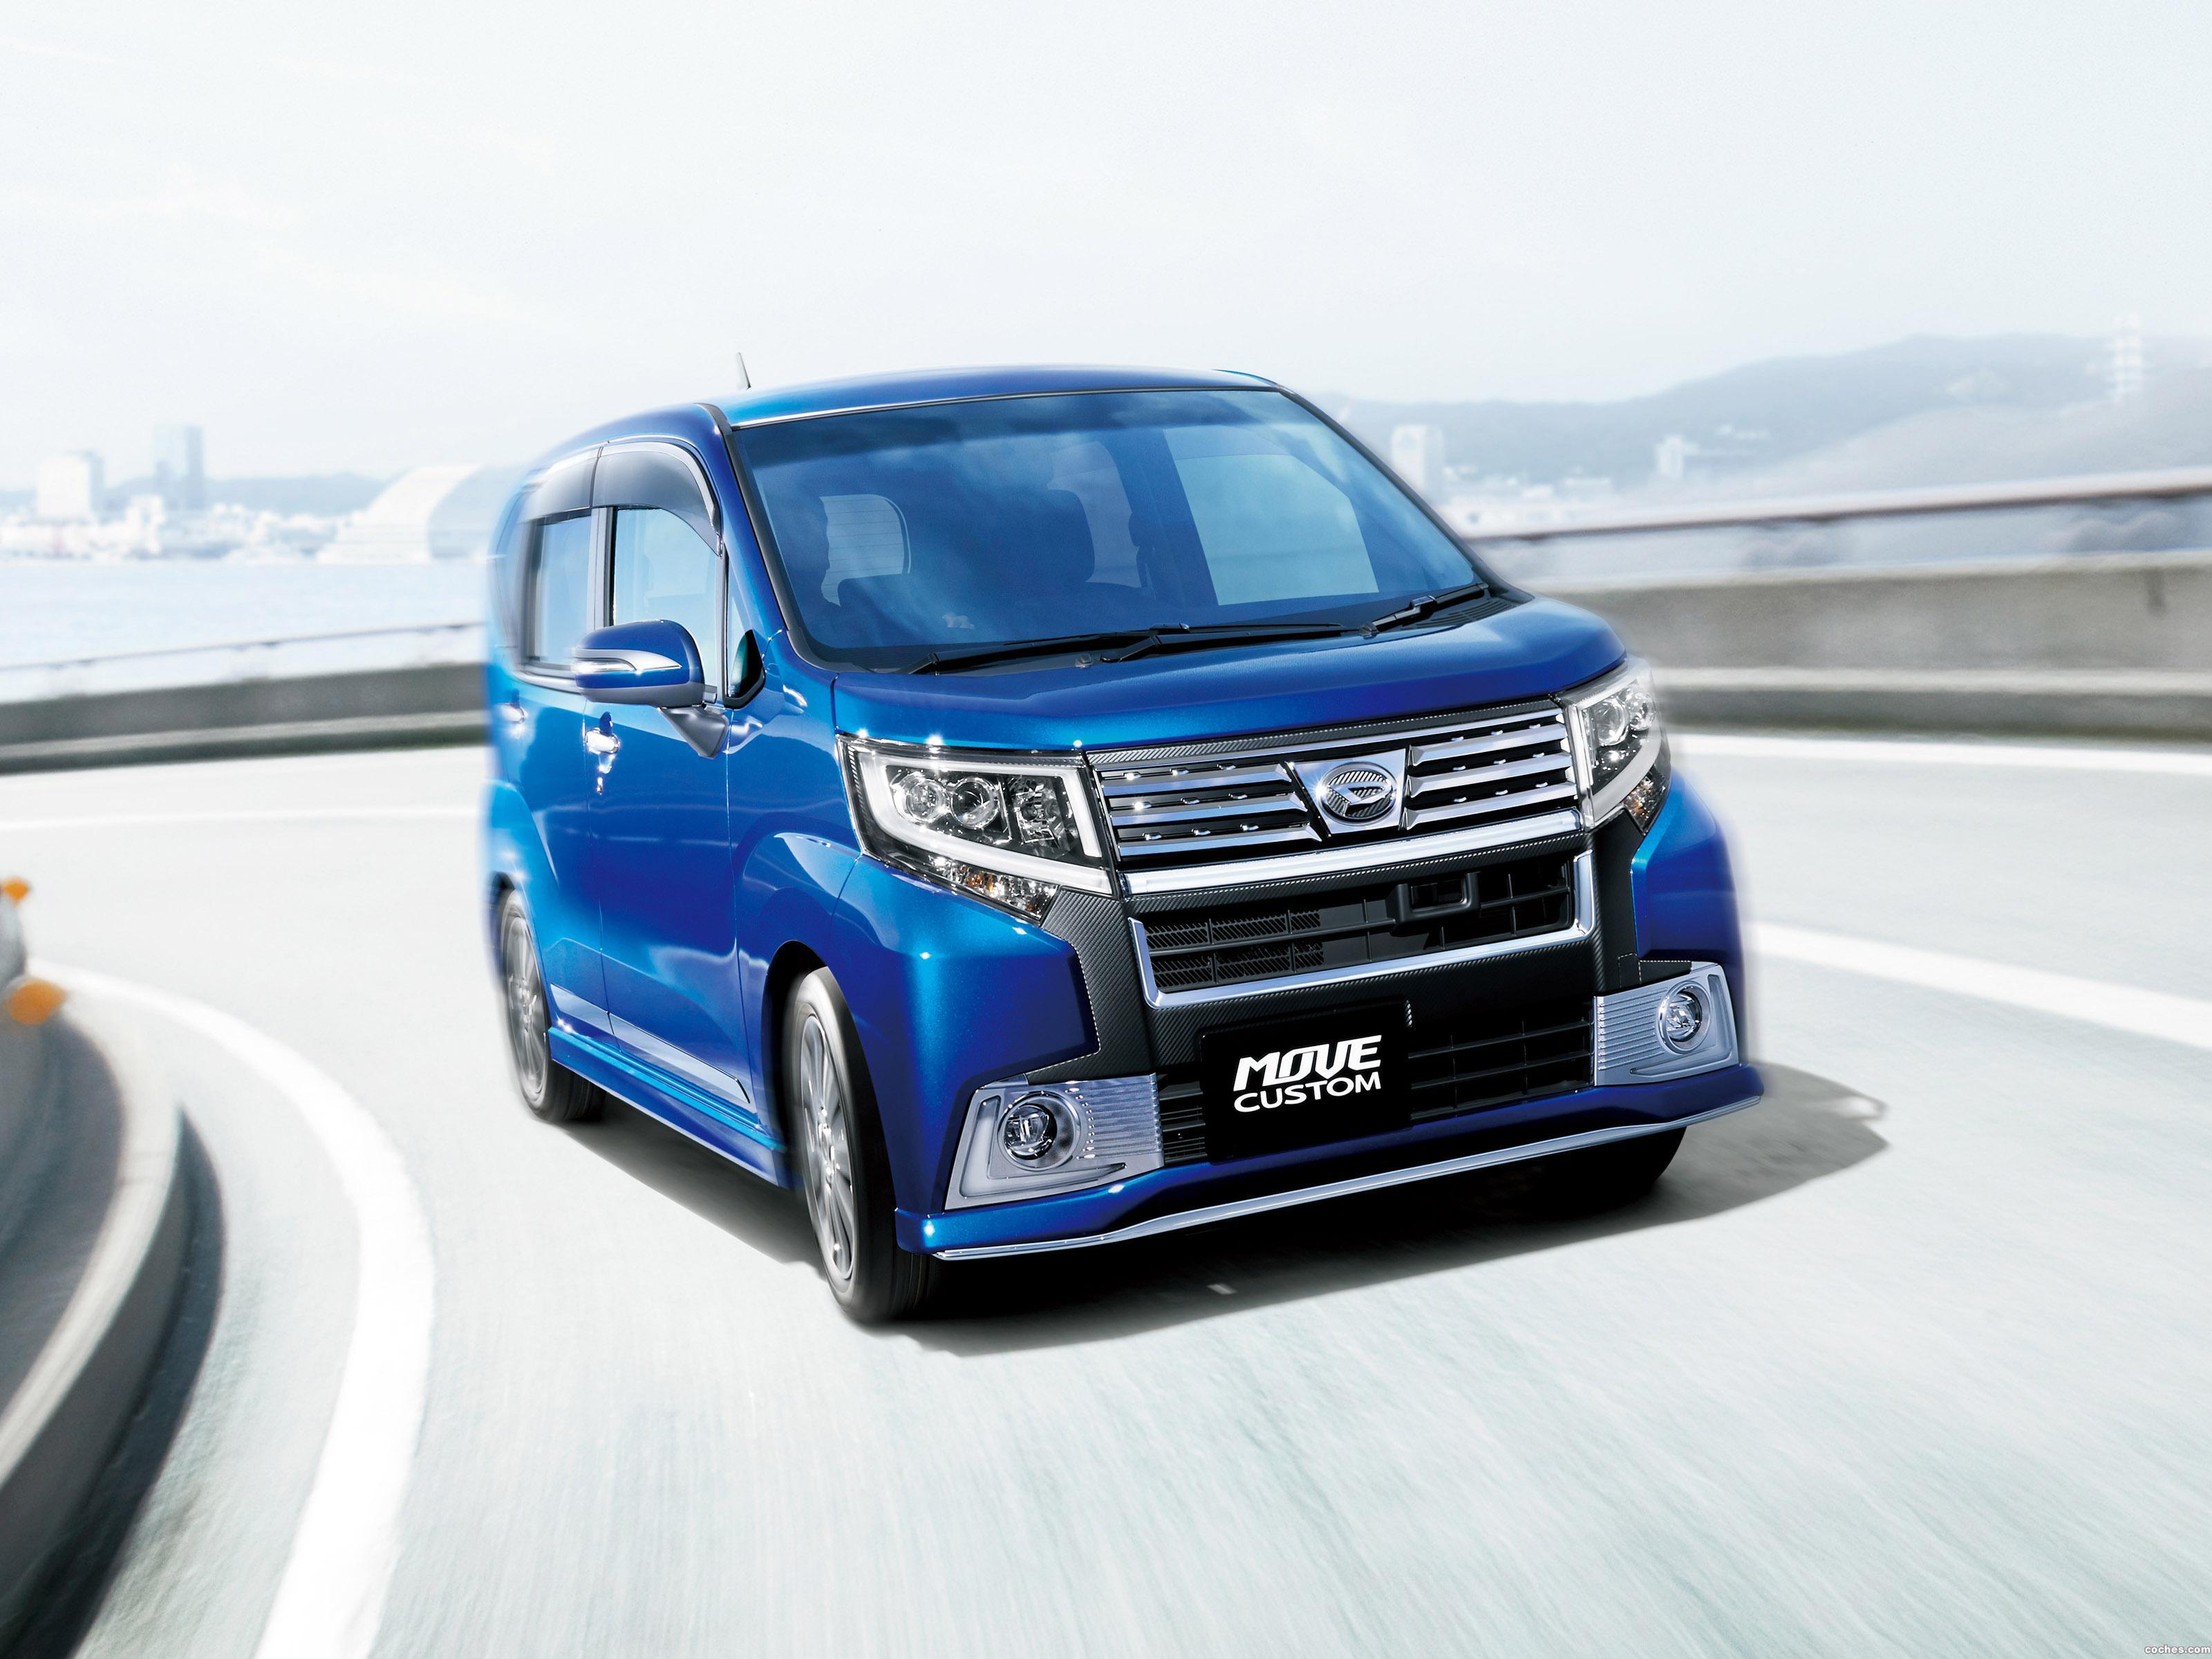 Foto 0 de Daihatsu Move Custom 2014